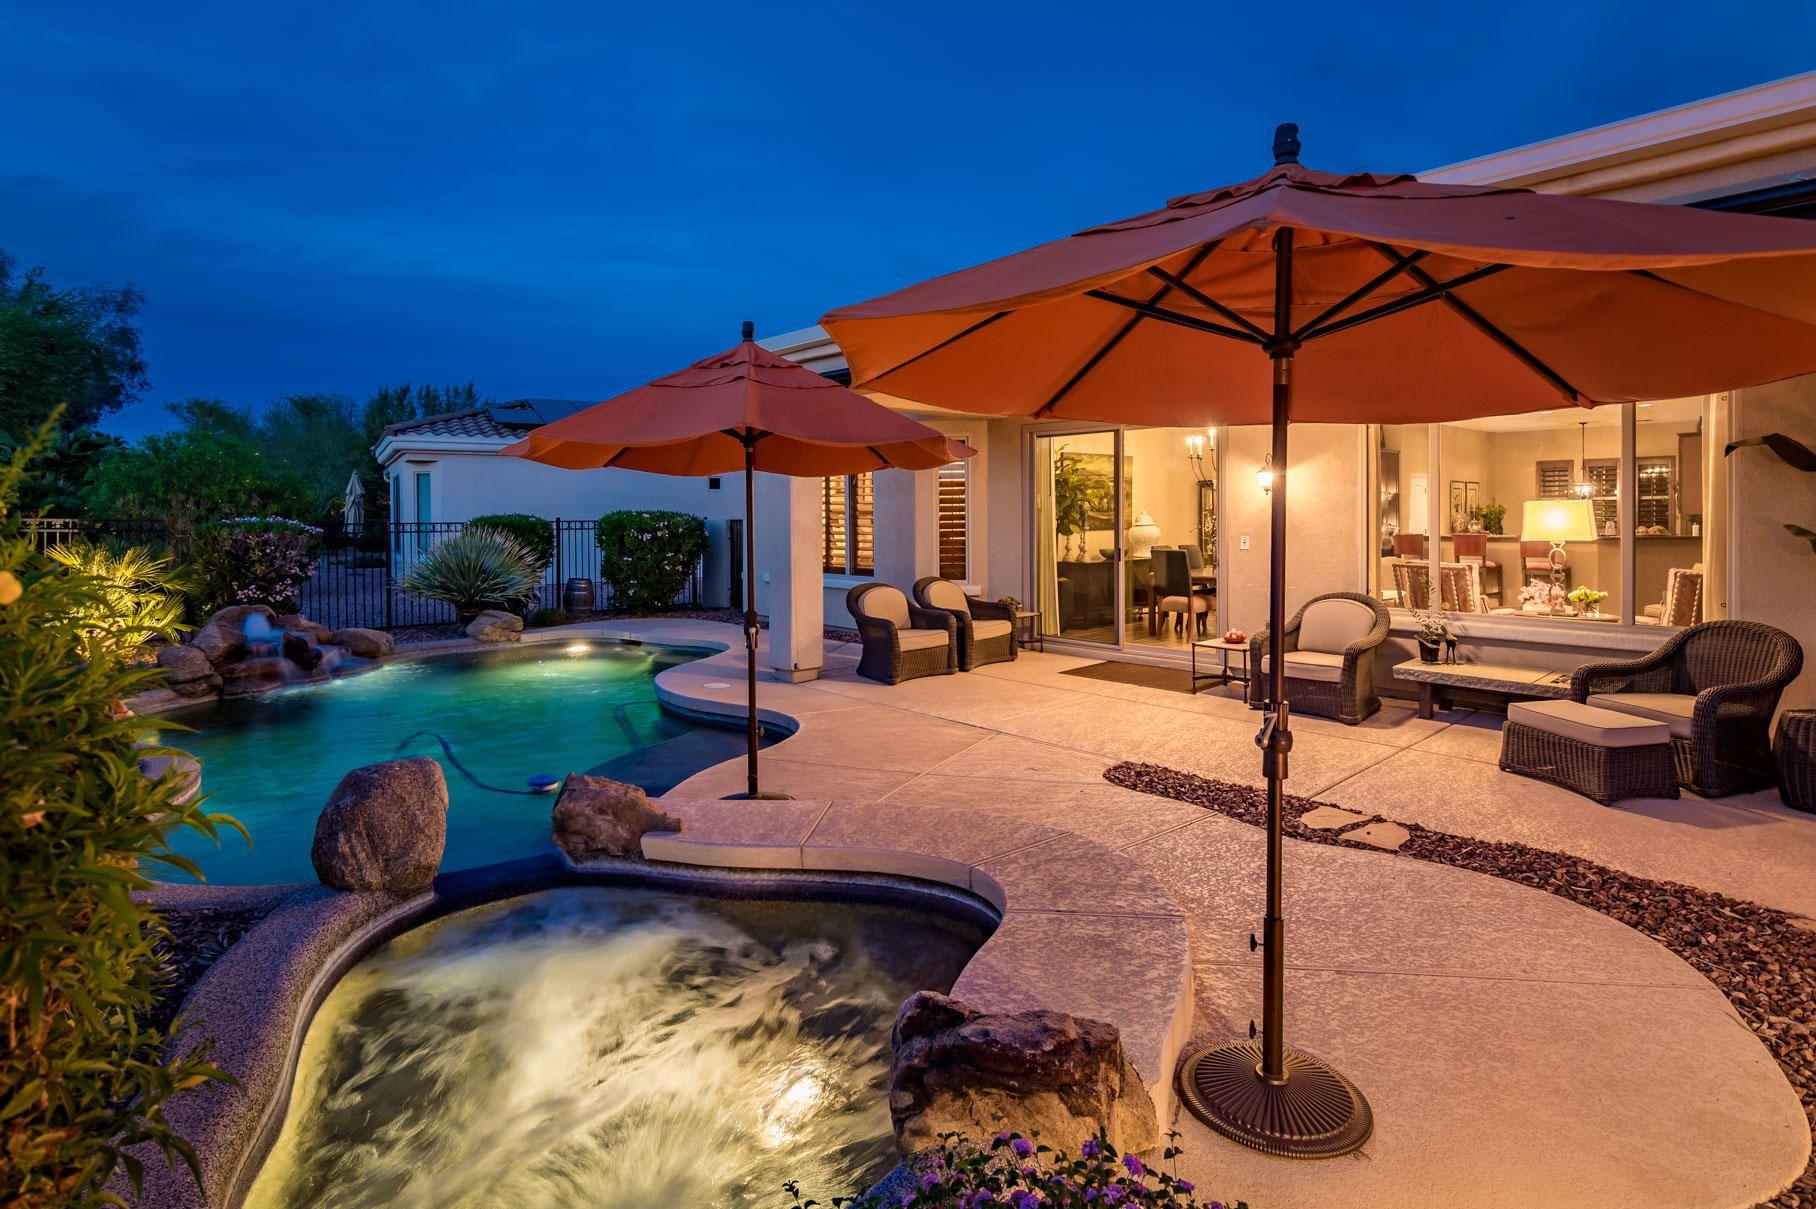 Photo of 22824 N PADARO Drive, Sun City West, AZ 85375 (MLS # 6220090)